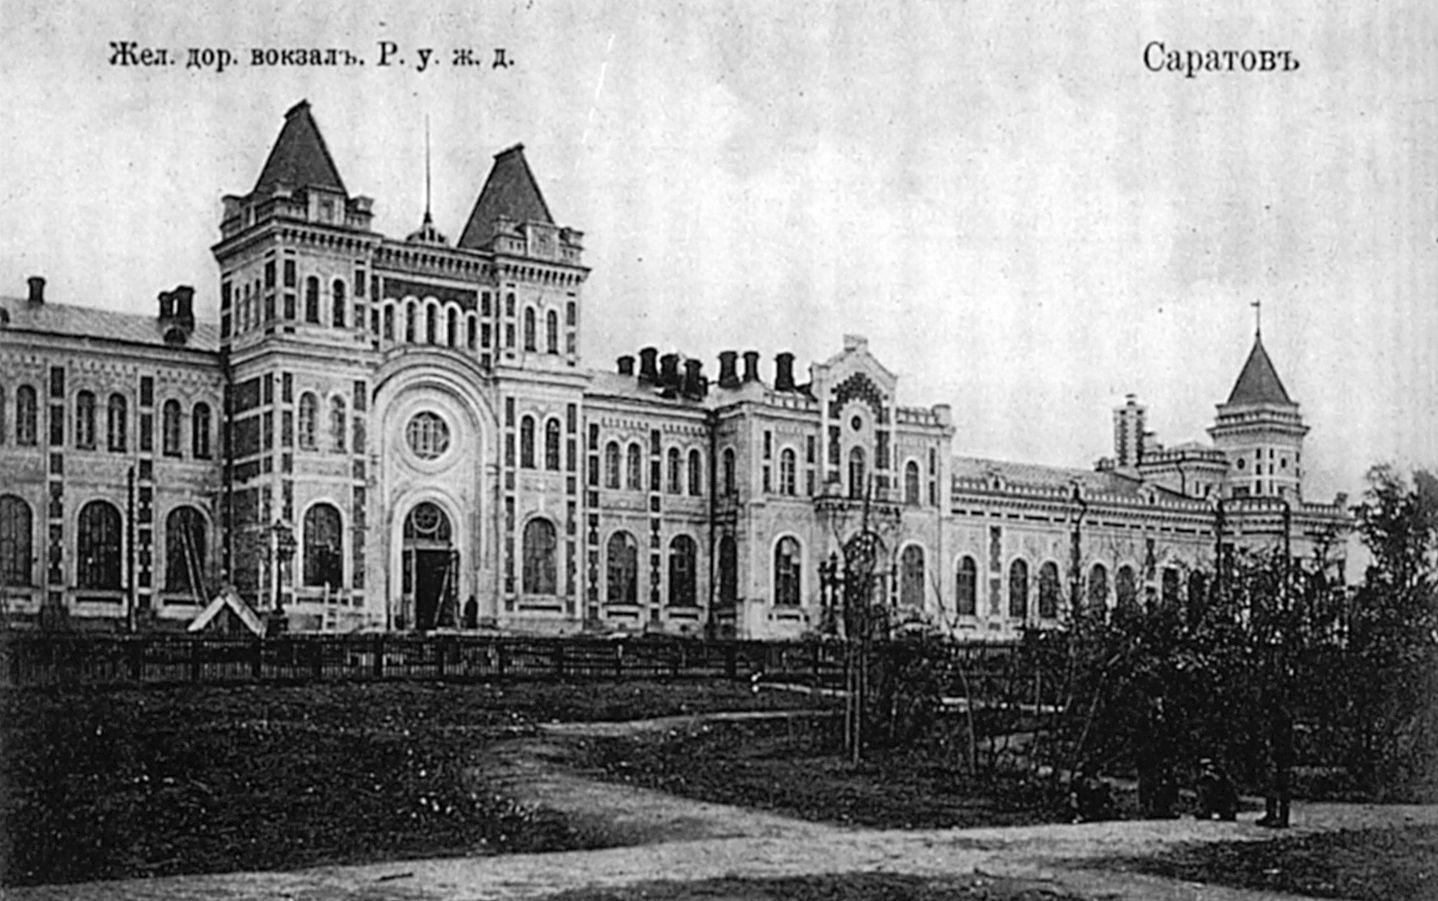 Вокзал Саратов